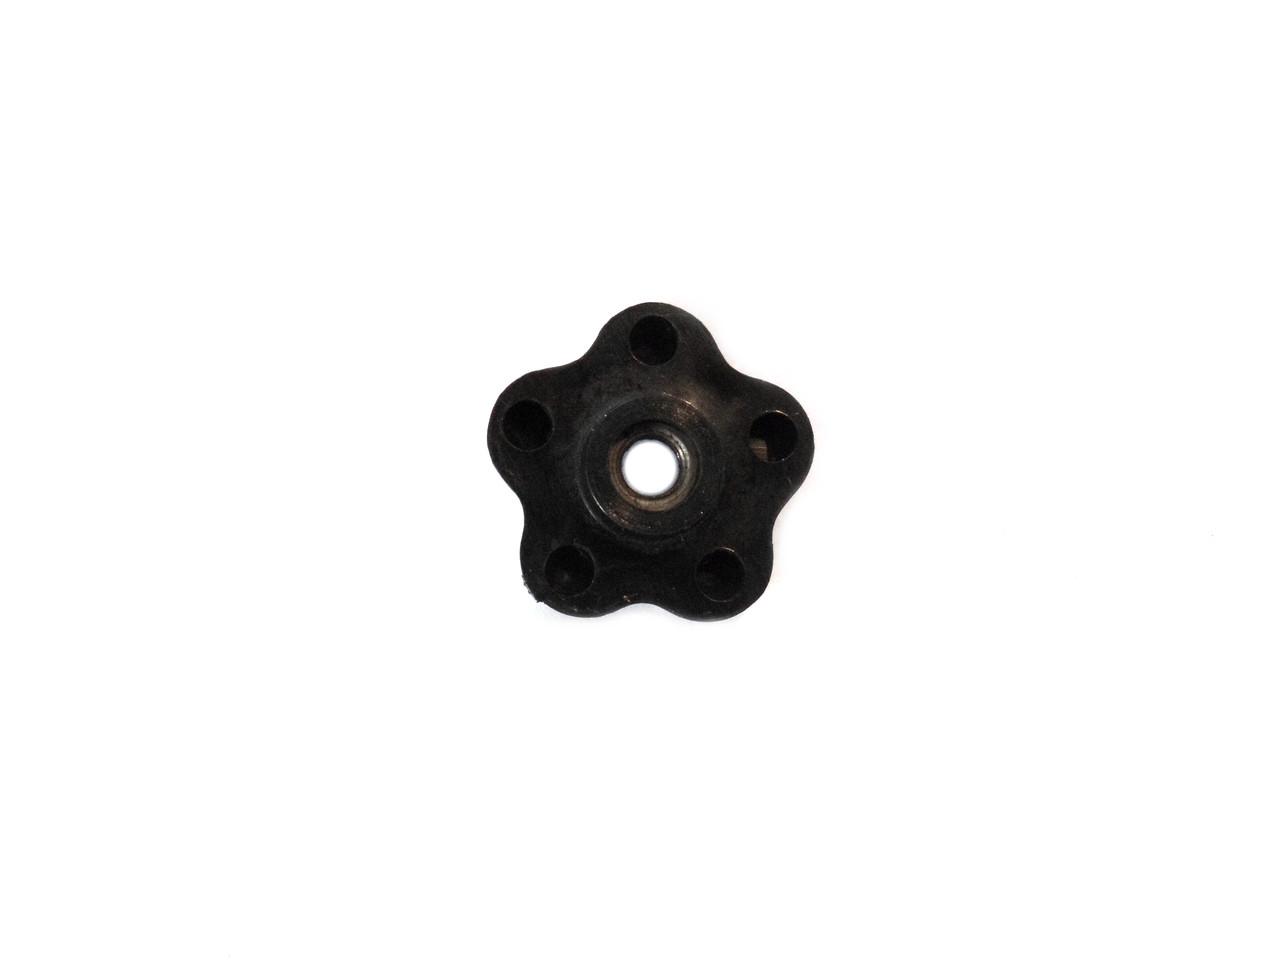 M6 Retro Black Flower Cable Adjuster Knob *Sold Each*